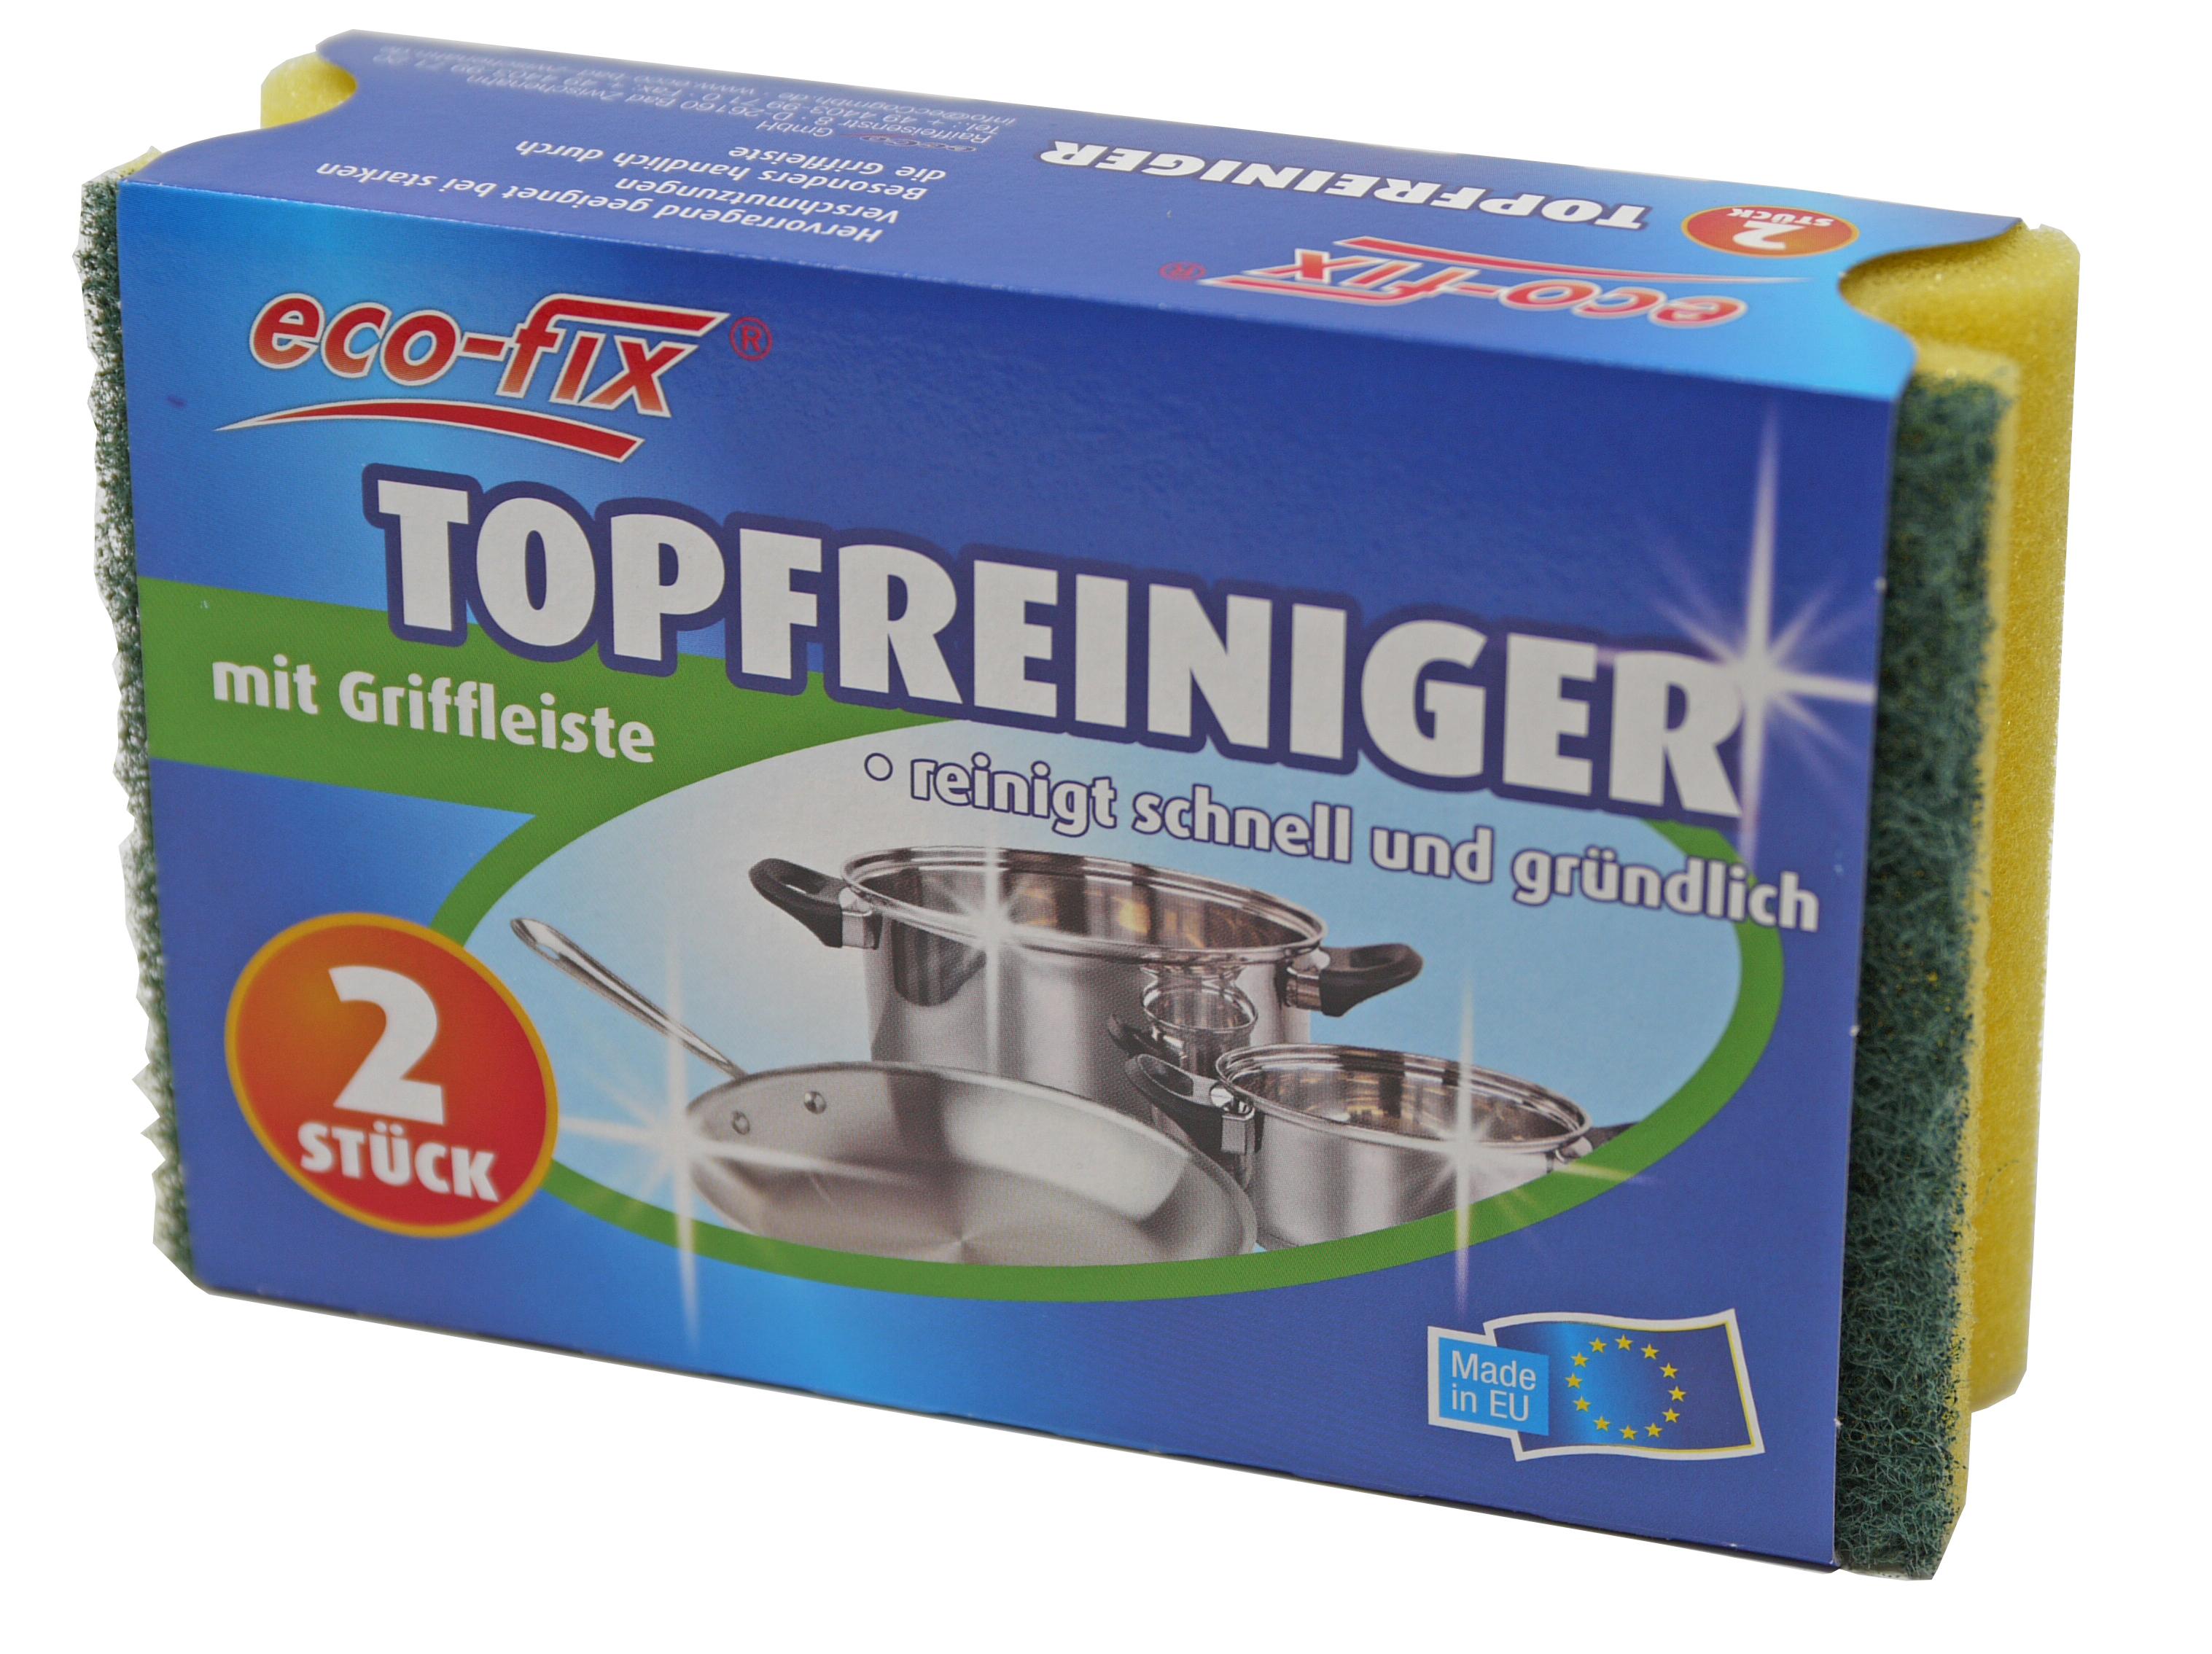 01300 - eco-fix Topfschwämme mit Griff 2er